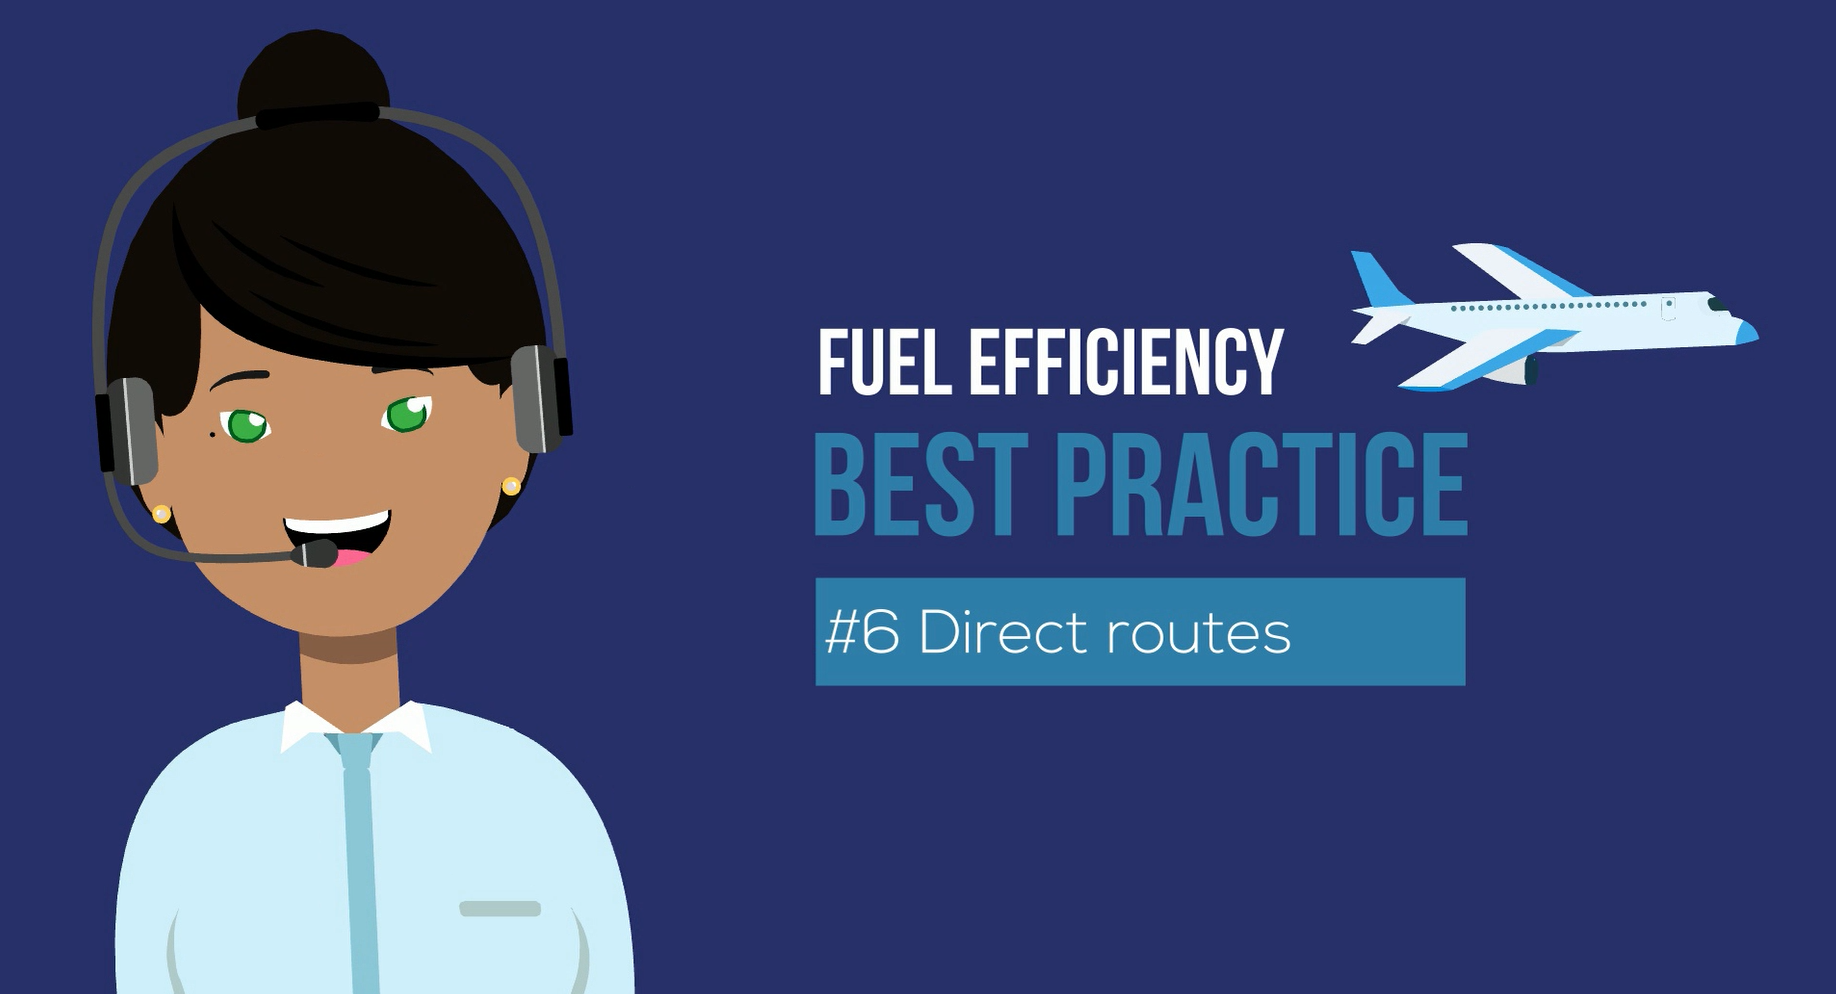 fuel efficiency best practice - direct routes